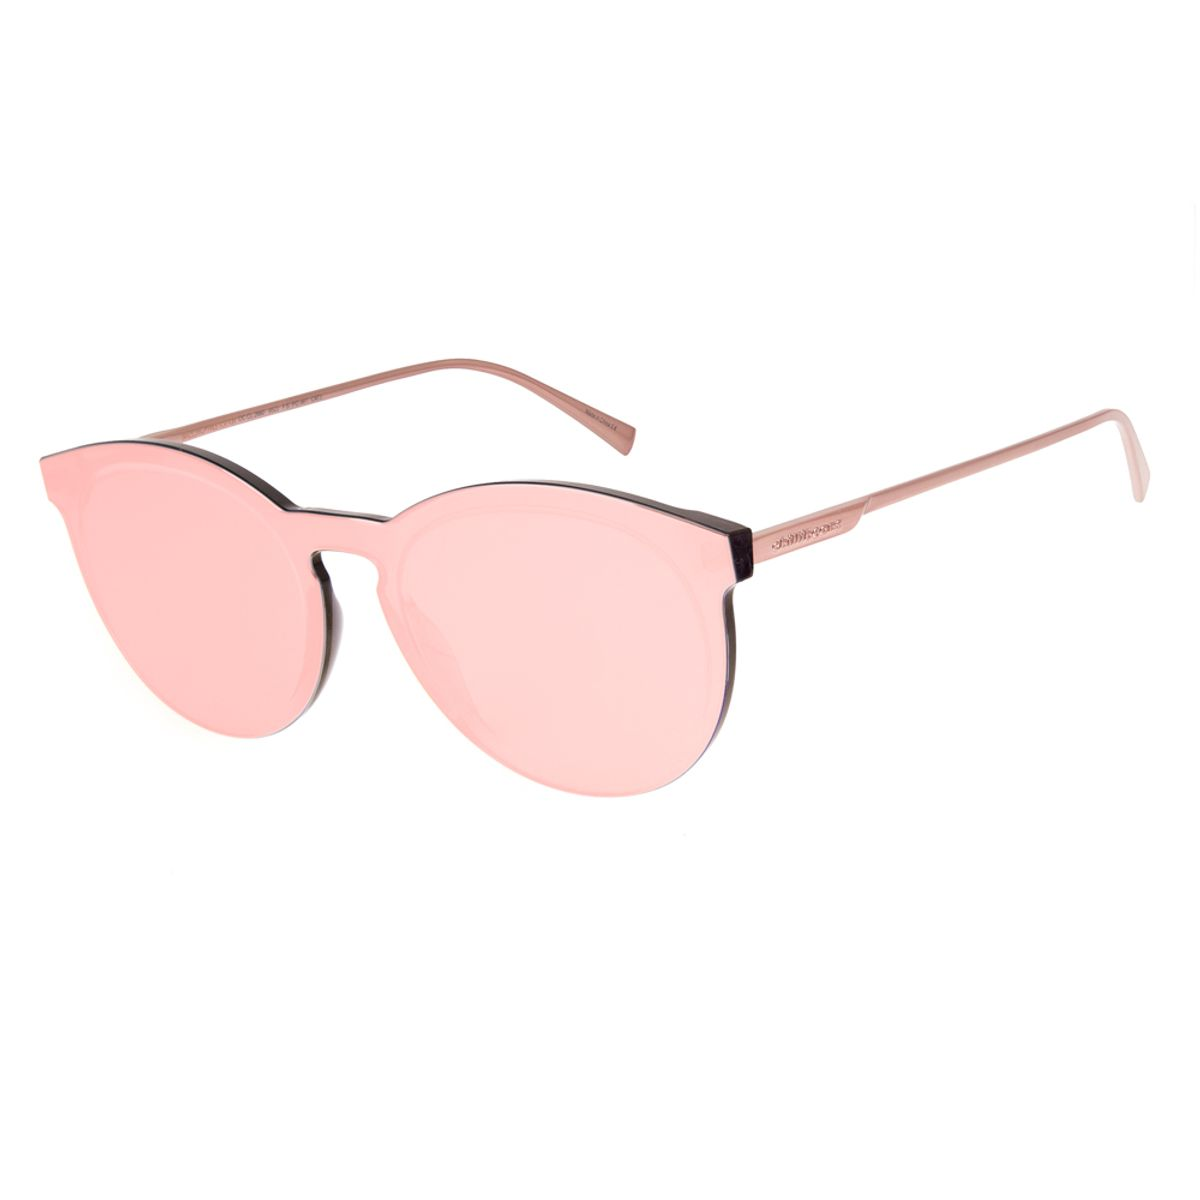 1278ac002 Óculos De Sol Chilli Beans Feminino Block Redondo Rosa 2660 - Chilli ...